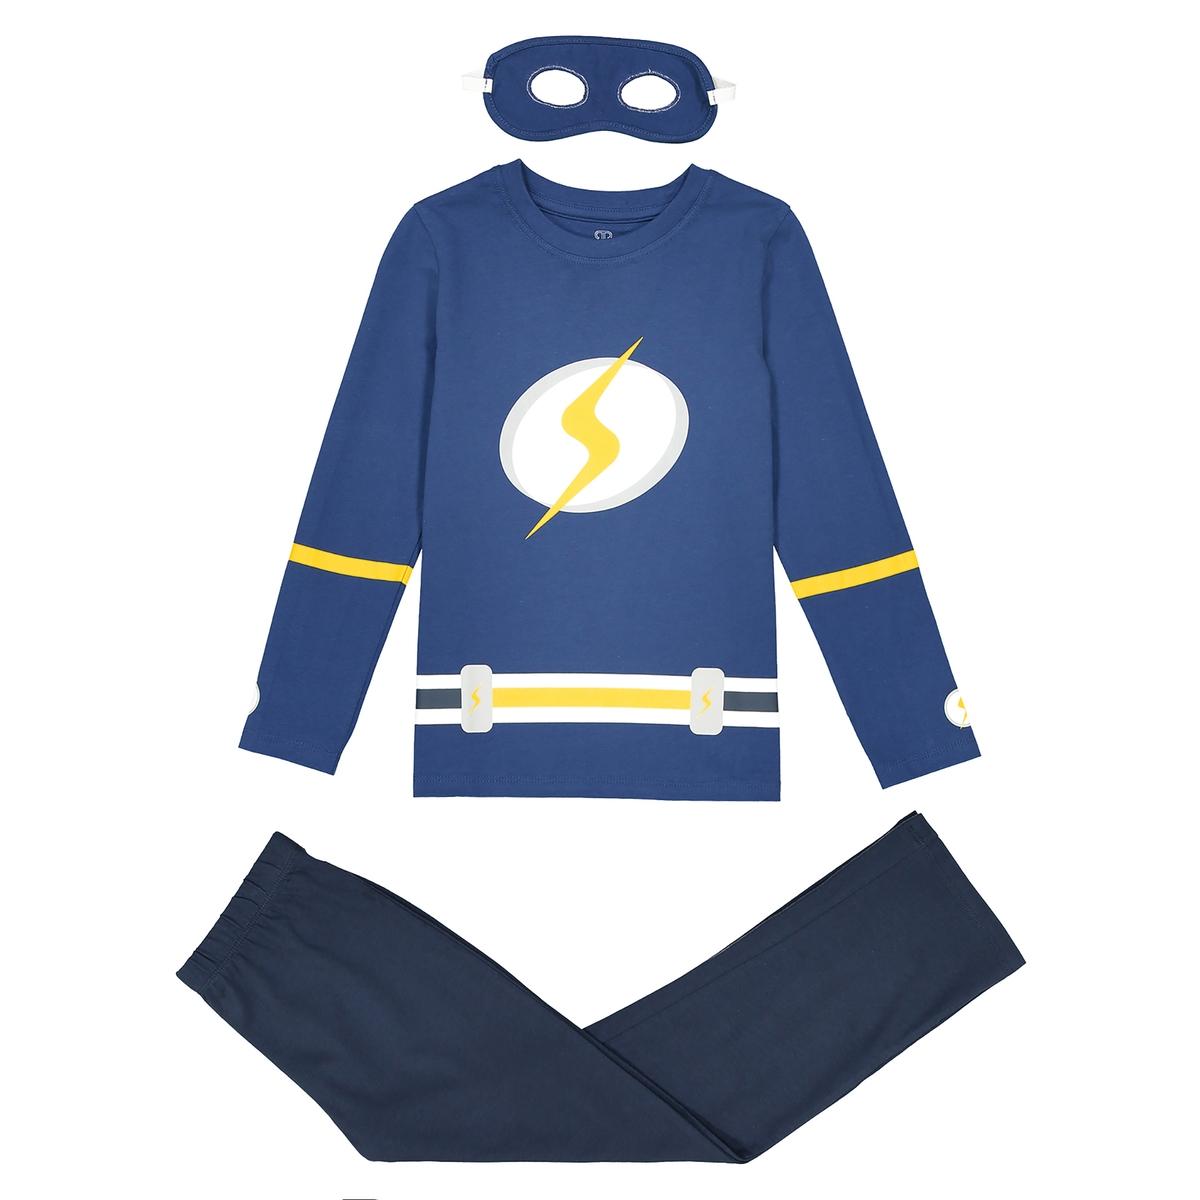 Пижама в стиле костюма супергероя 2-12 лет